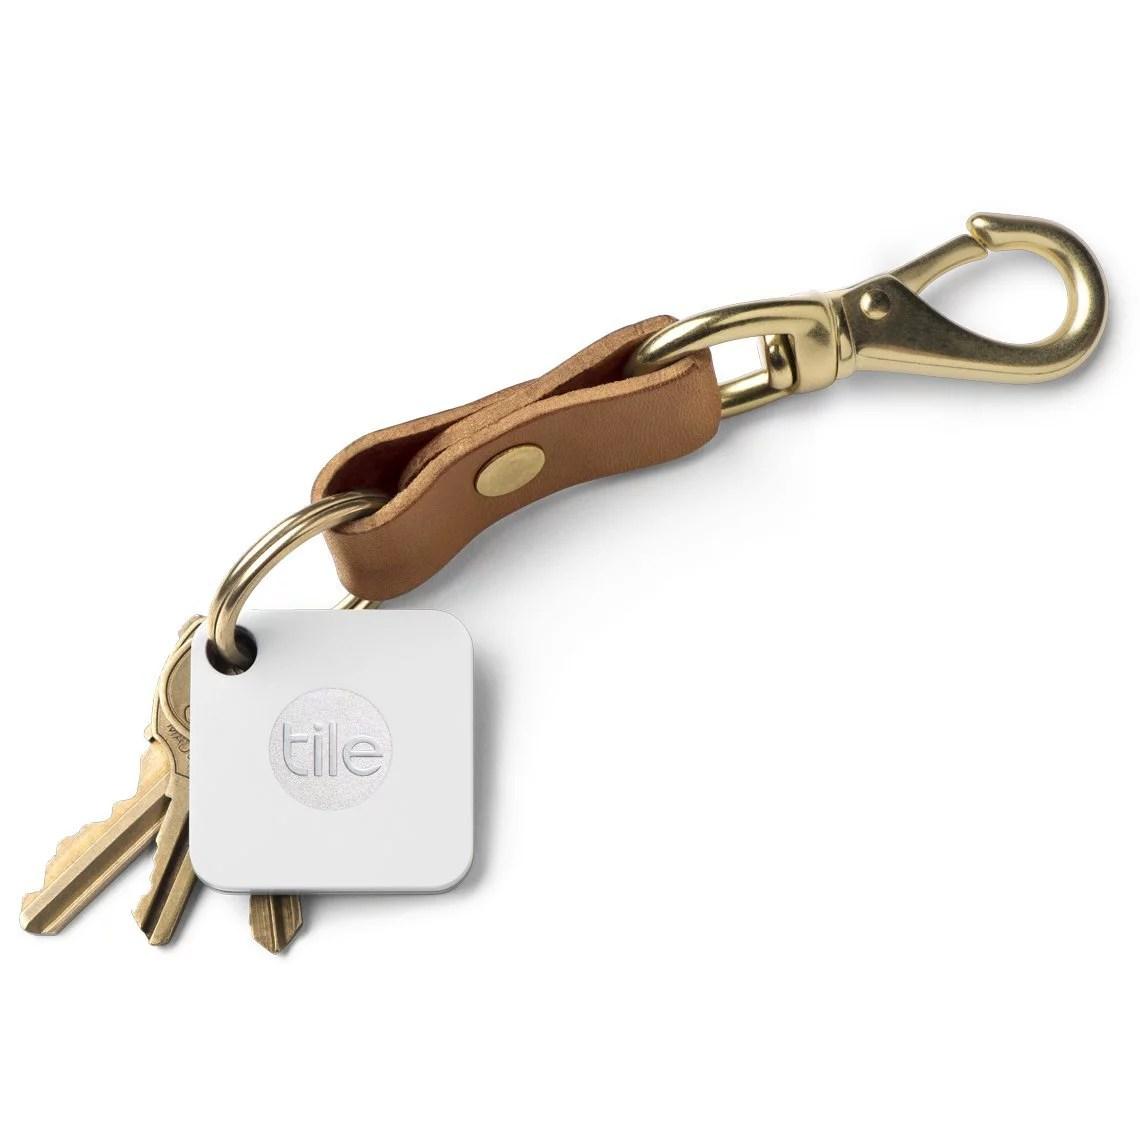 tile mate key phone finder bluetooth tracker water resistant 150 ft 1 pack refurbished